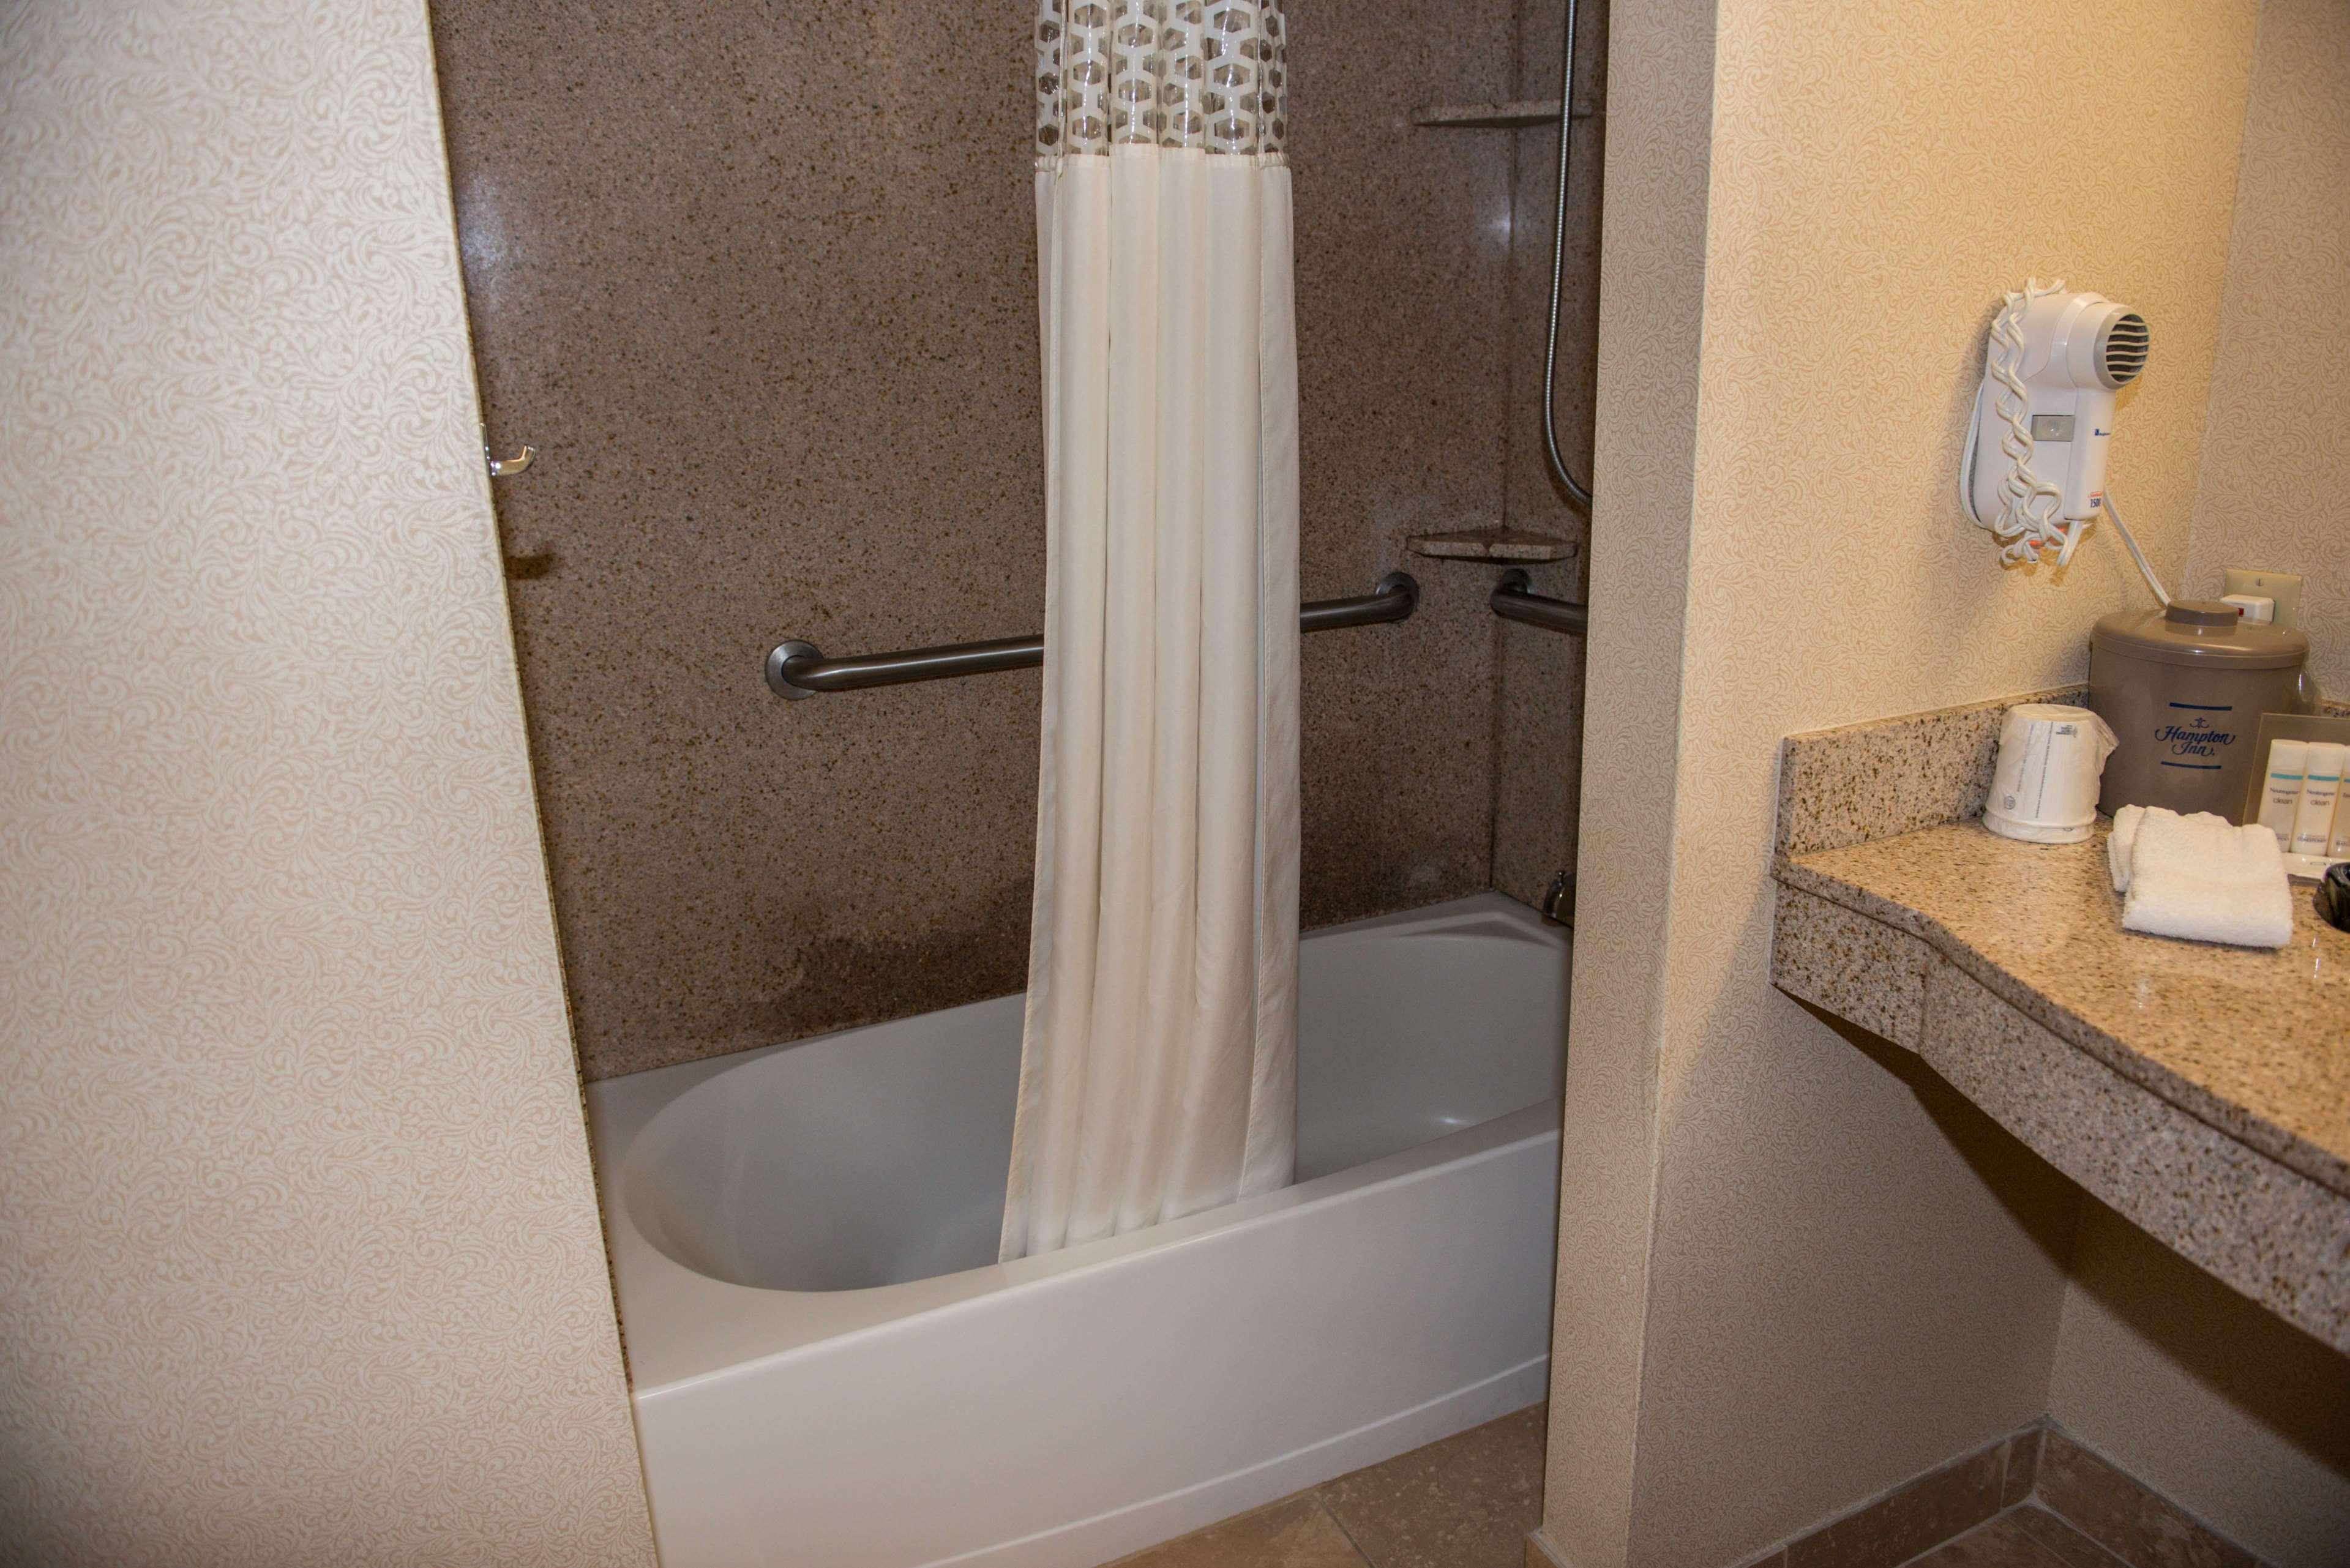 Hampton Inn & Suites Bremerton image 37